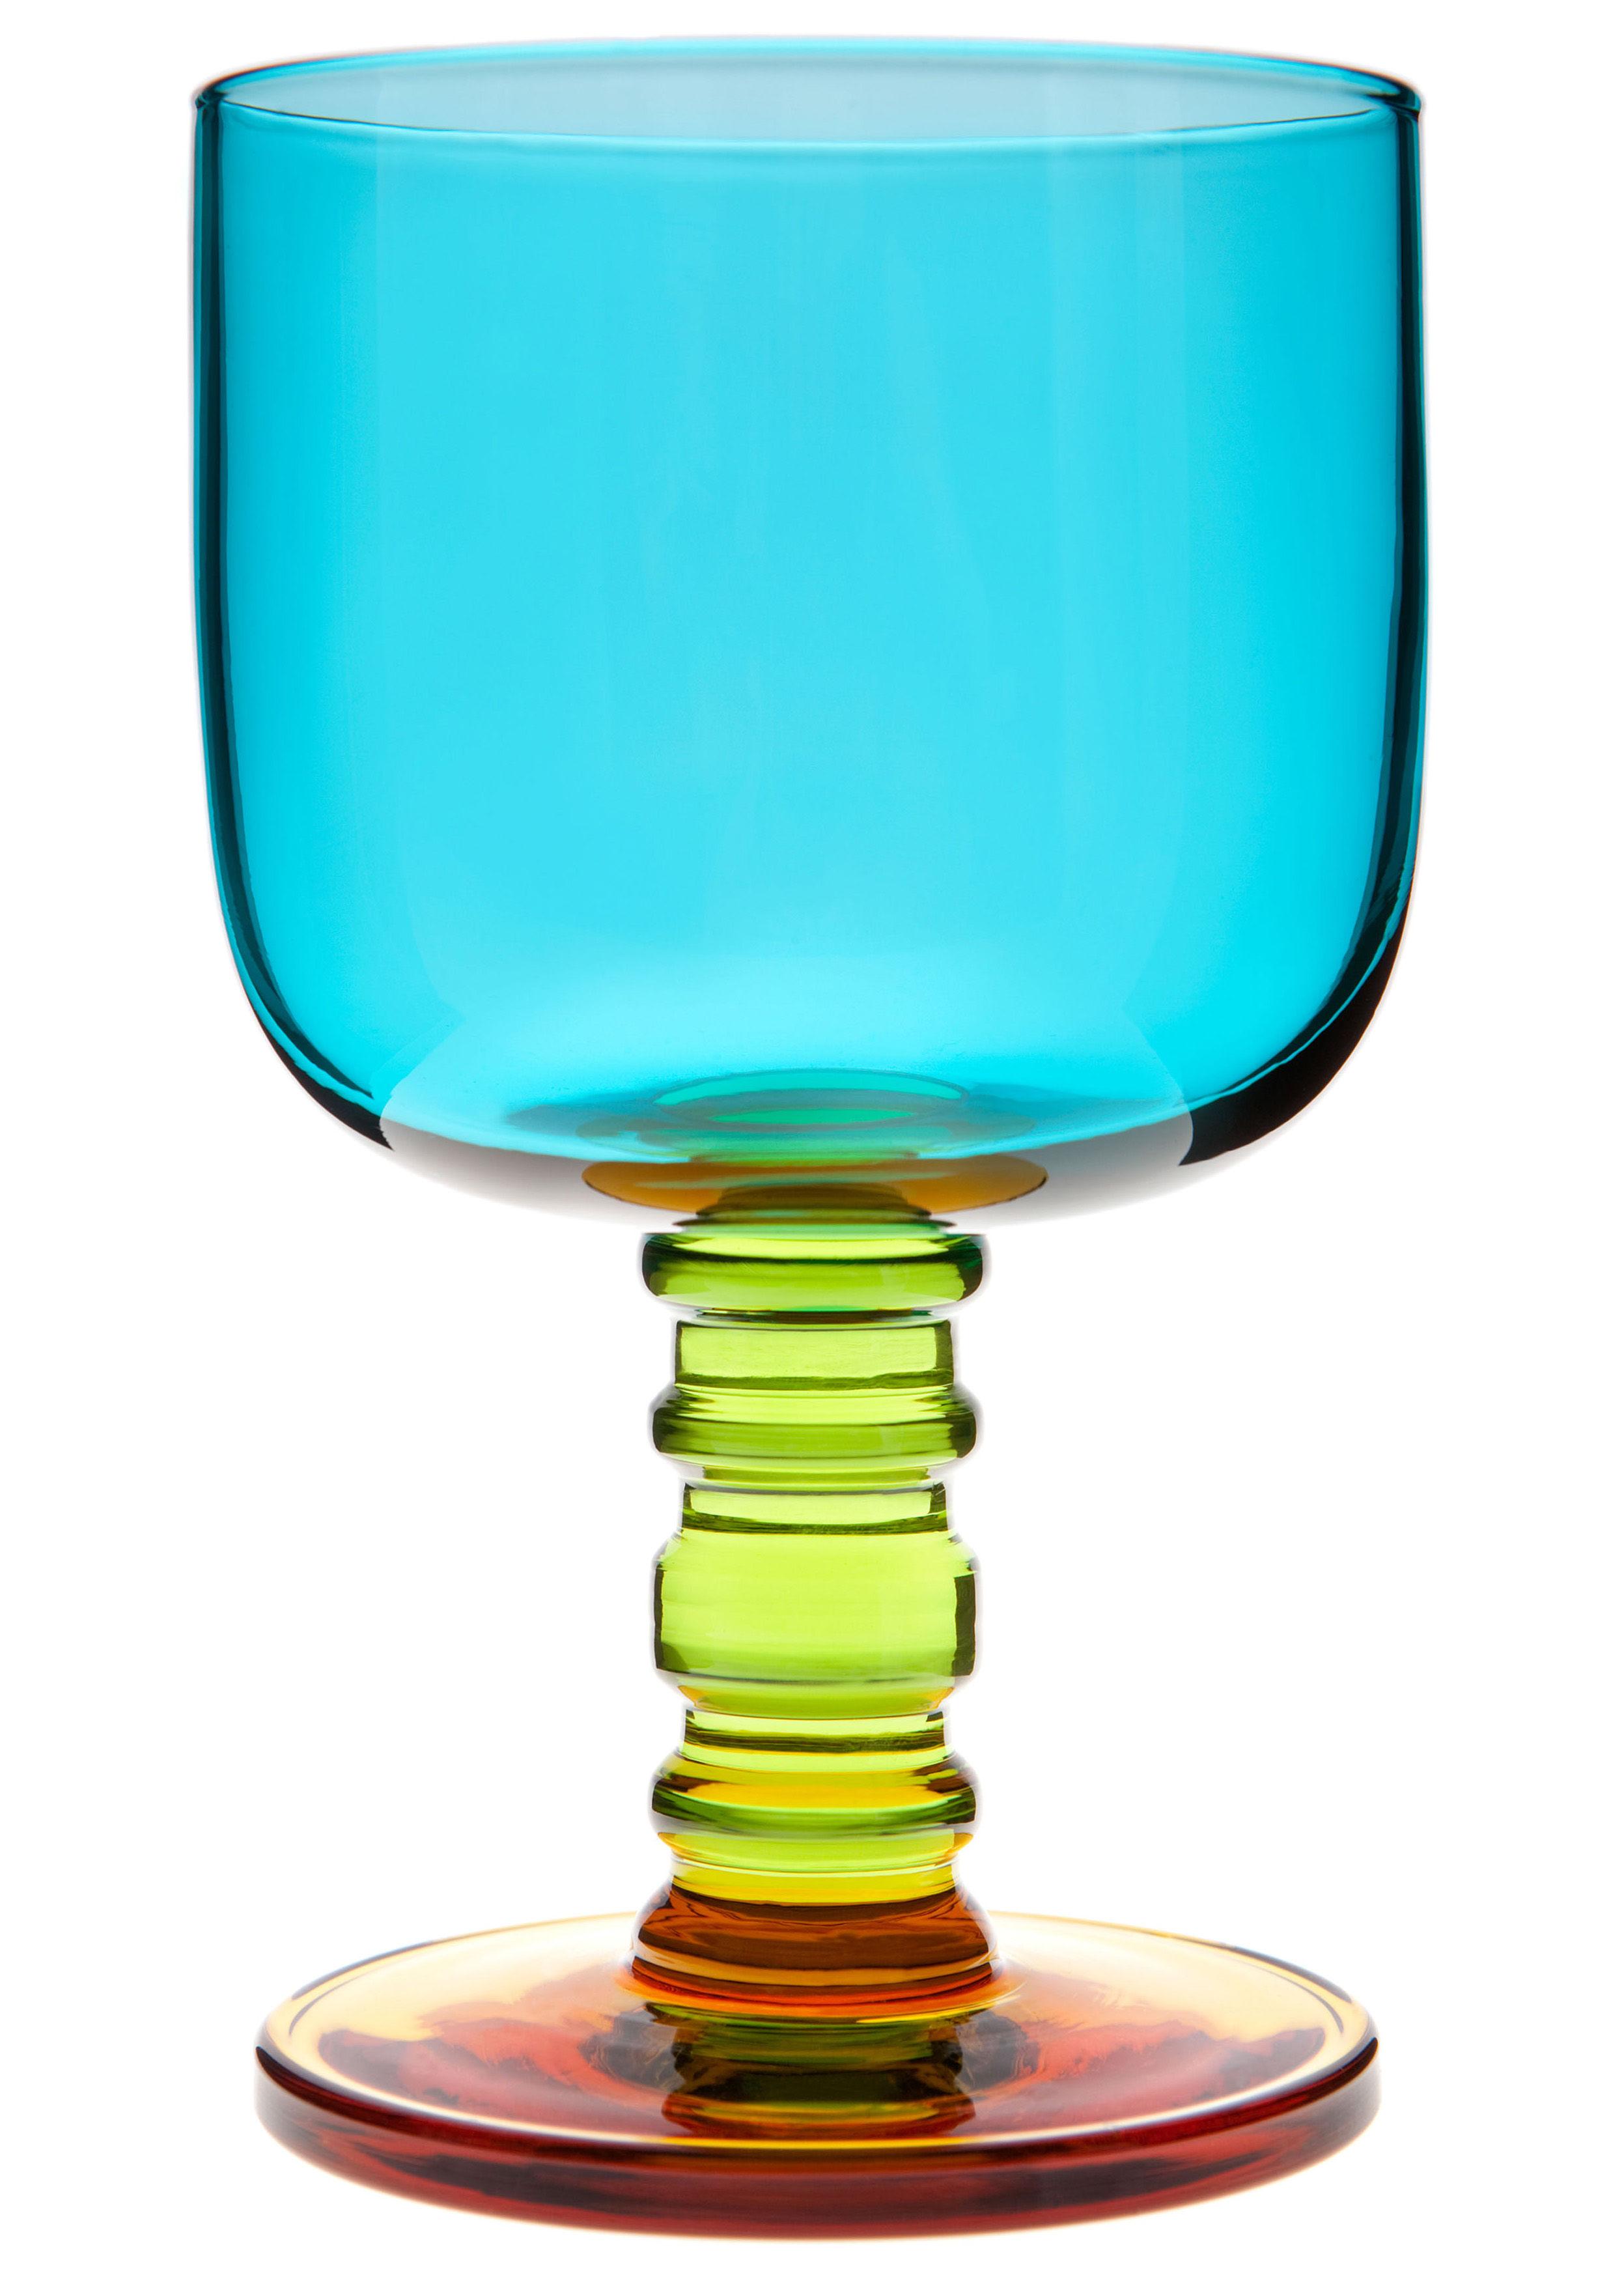 Arts de la table - Verres  - Verre à vin Sukat Makkaralla - Marimekko - Sukat Makkaralla / Turquoise, vert, jaune - Verre soufflé bouche